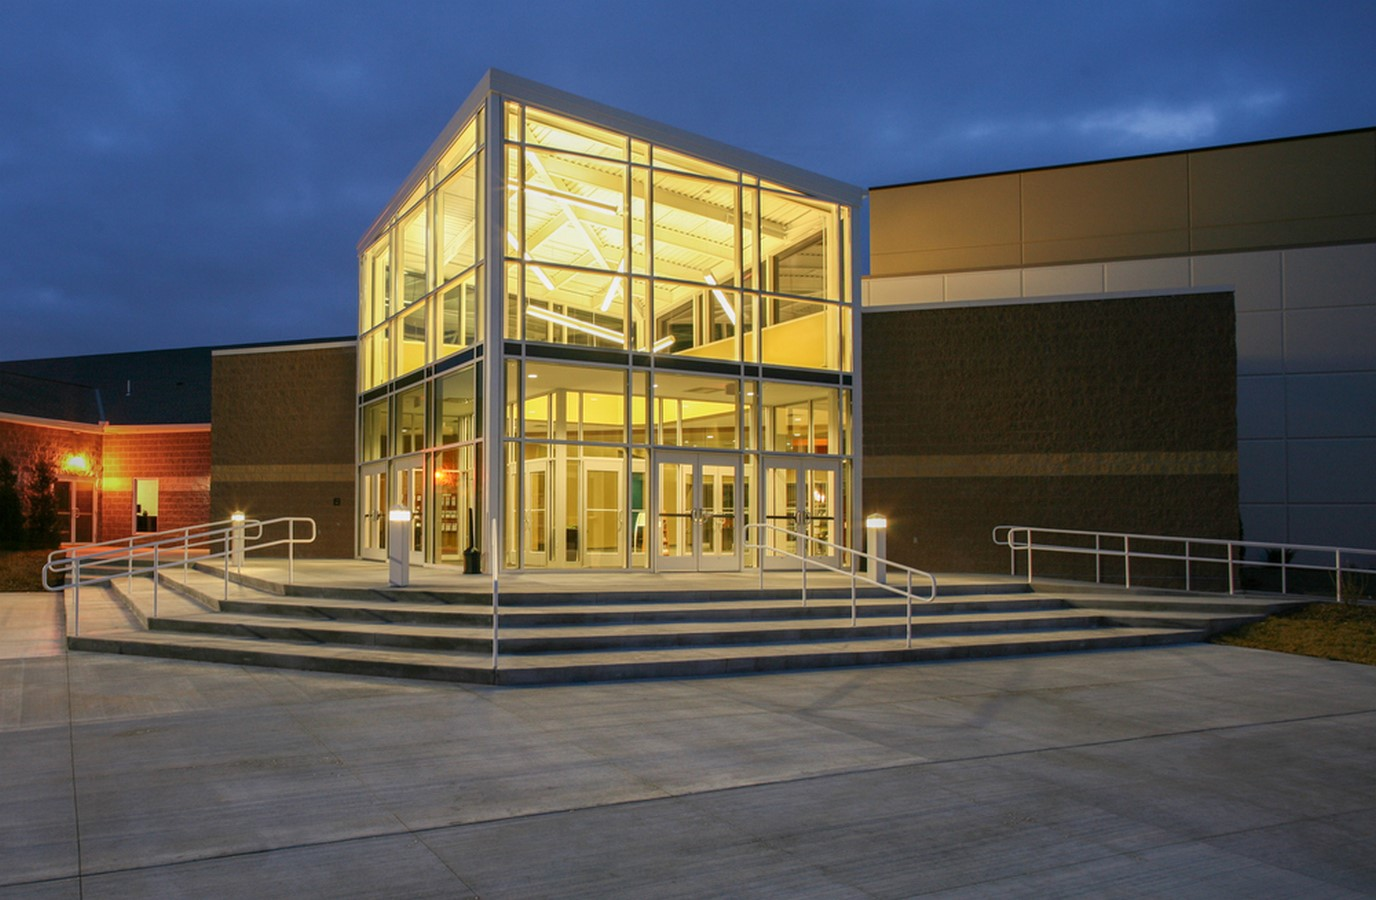 Architects in Kansas city - Top 90 Architects in Kansas city - Sheet55